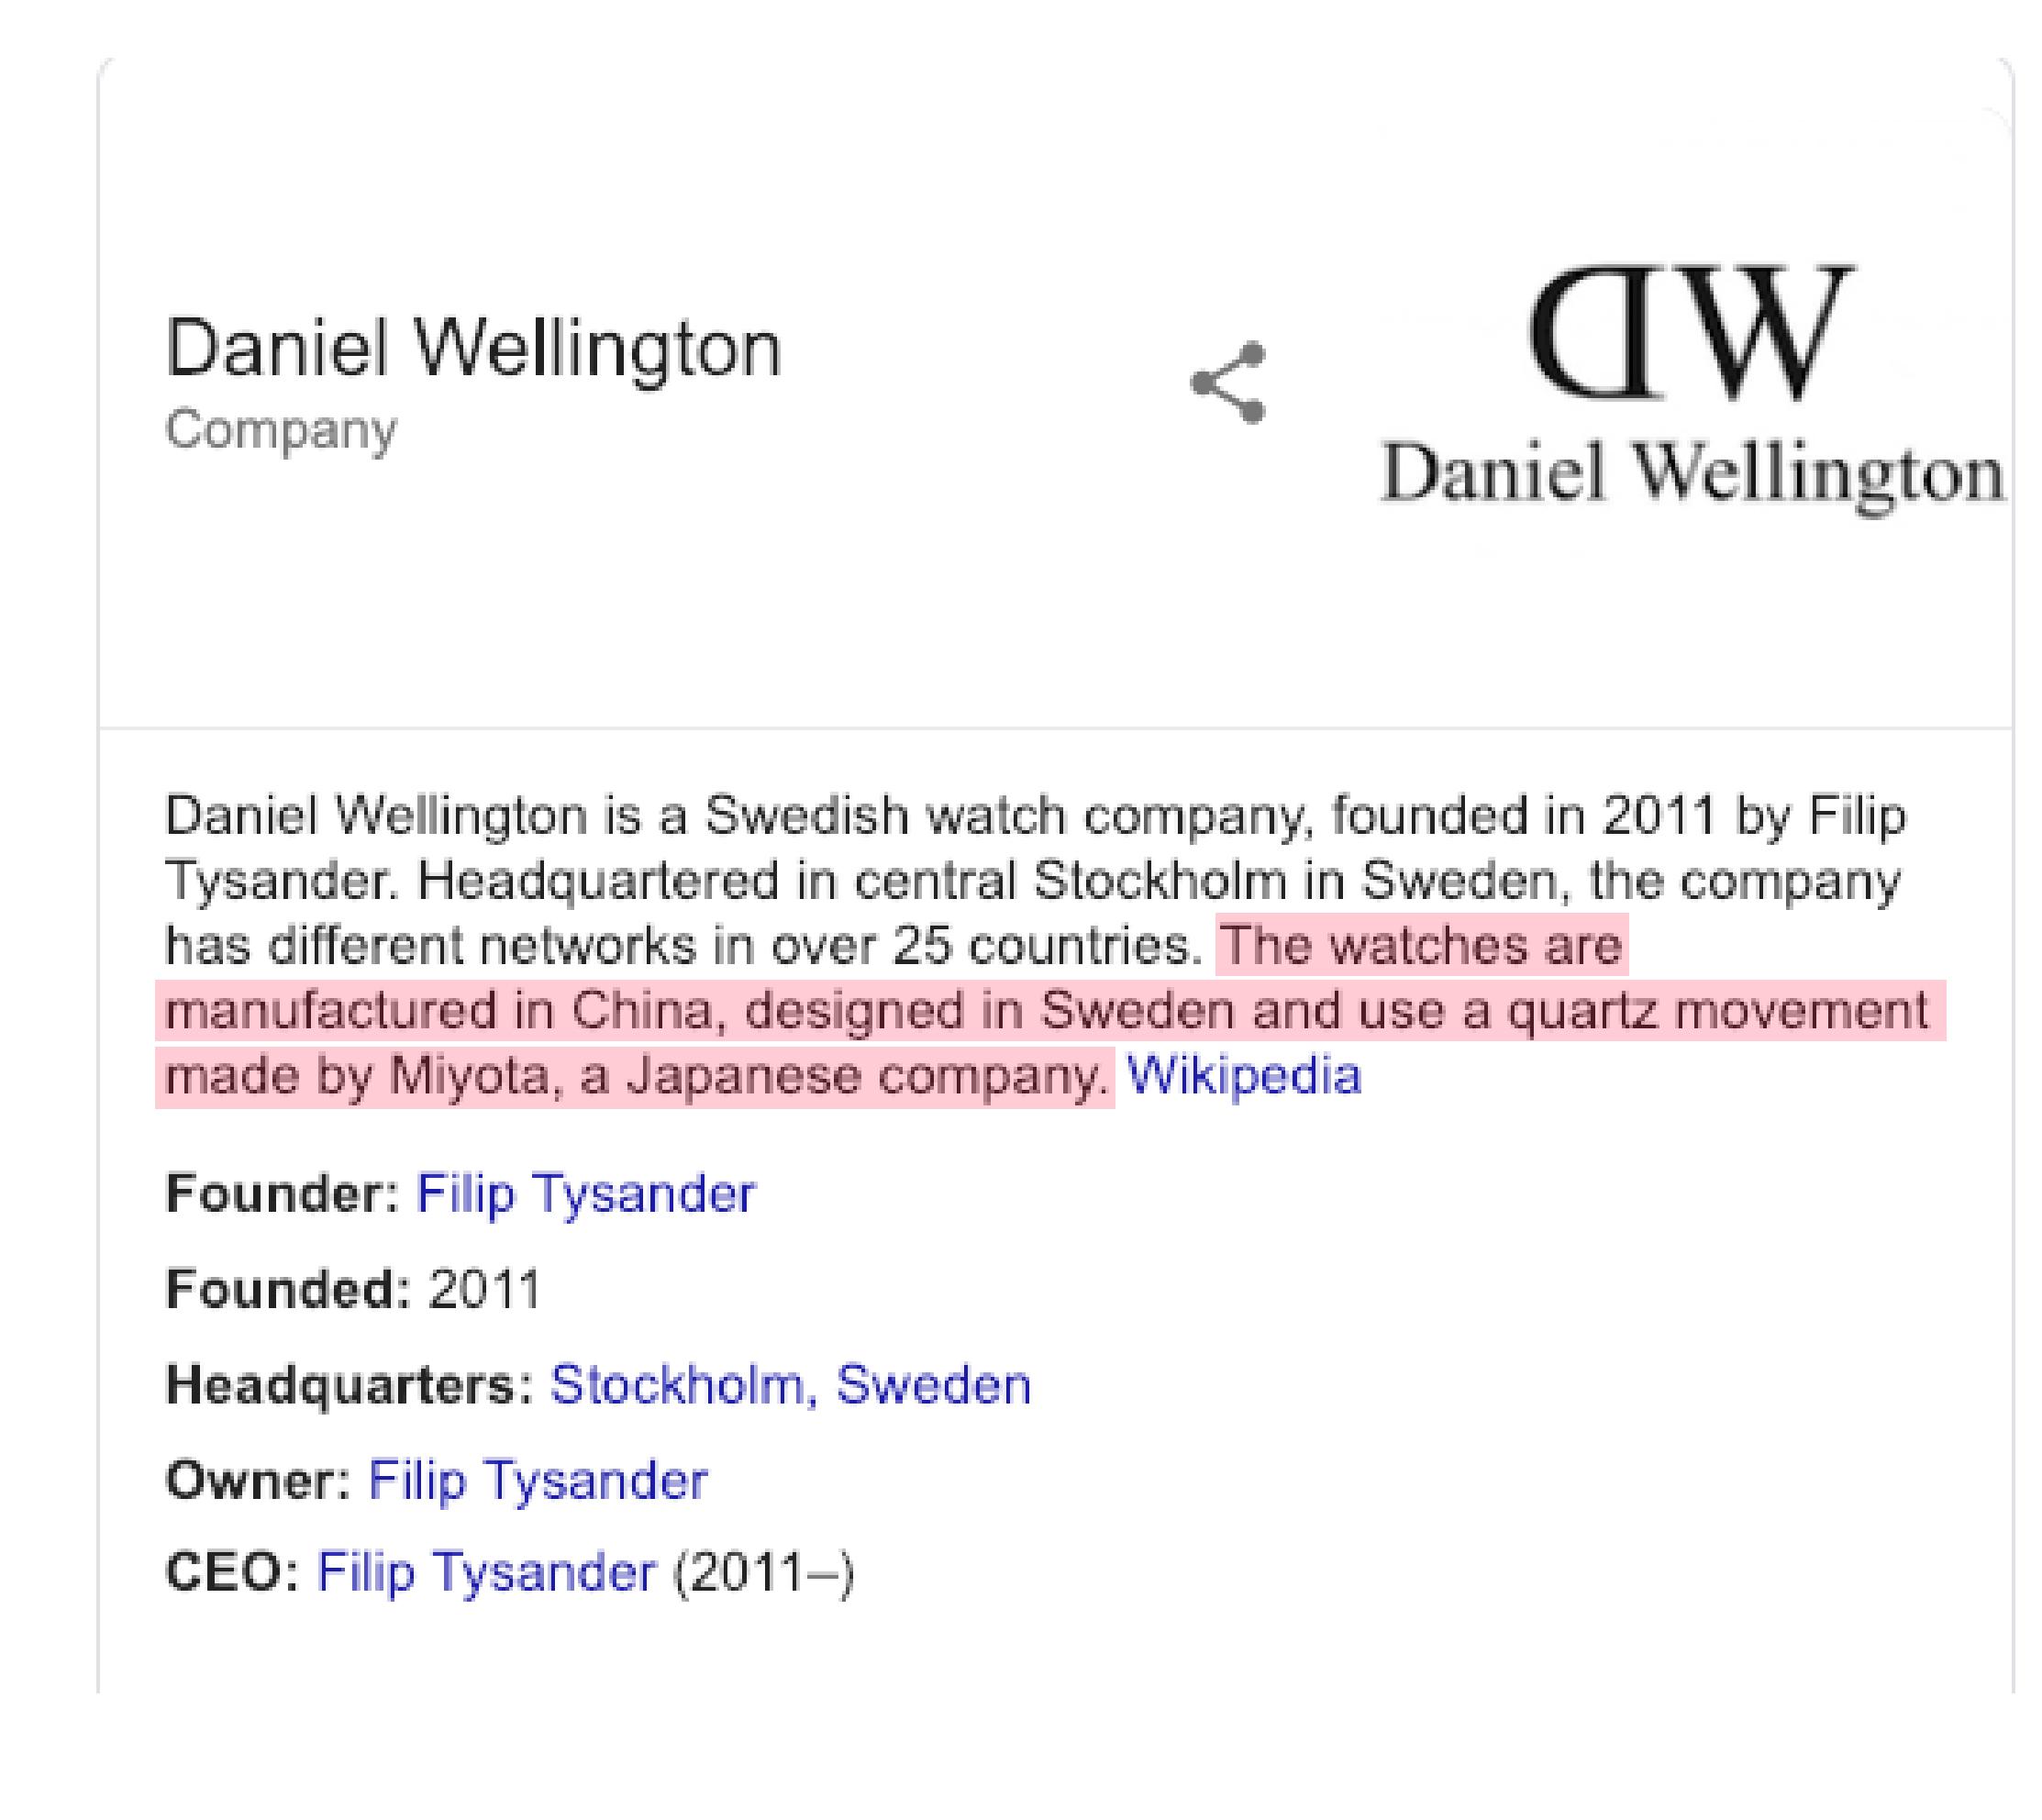 daniel wellington description-01.jpg